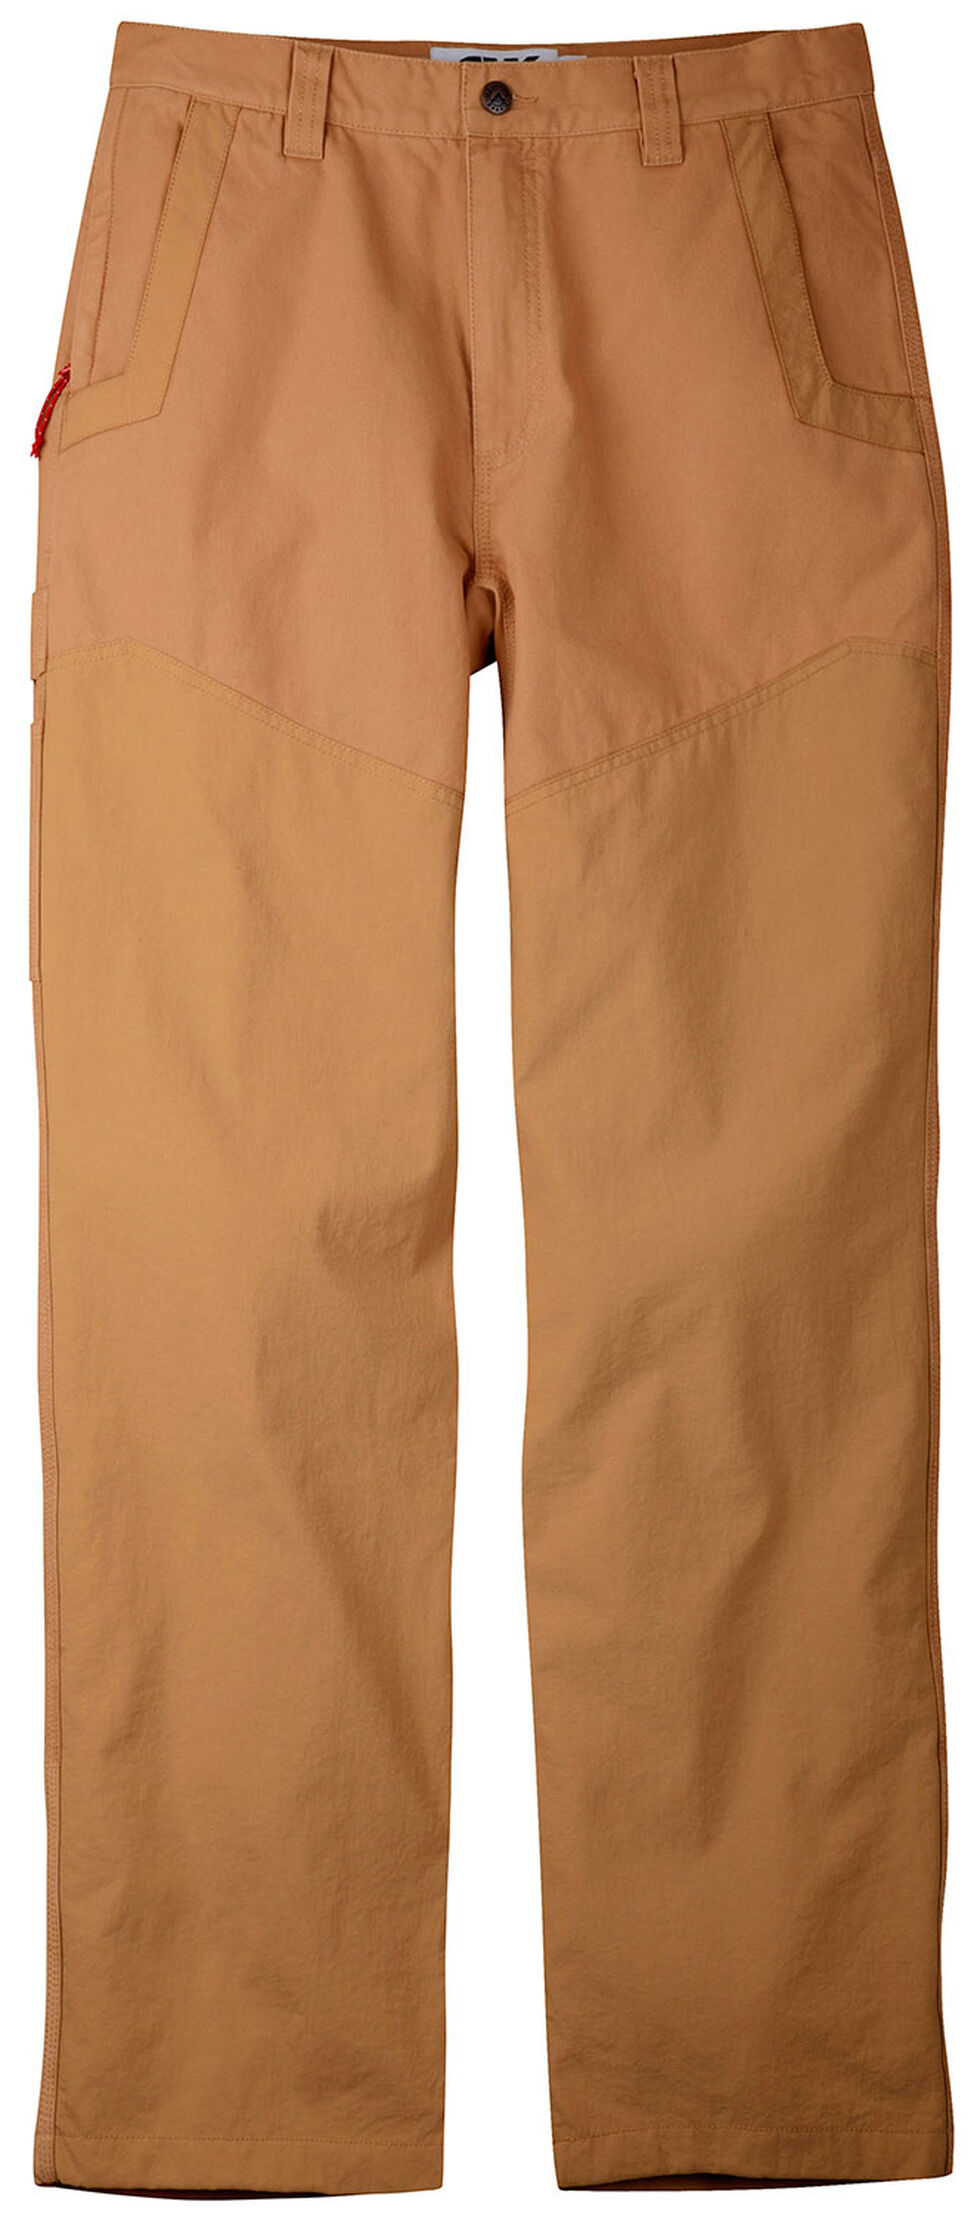 Mountain Khakis Men's Relaxed Fit Original Field Pants, Brown, hi-res